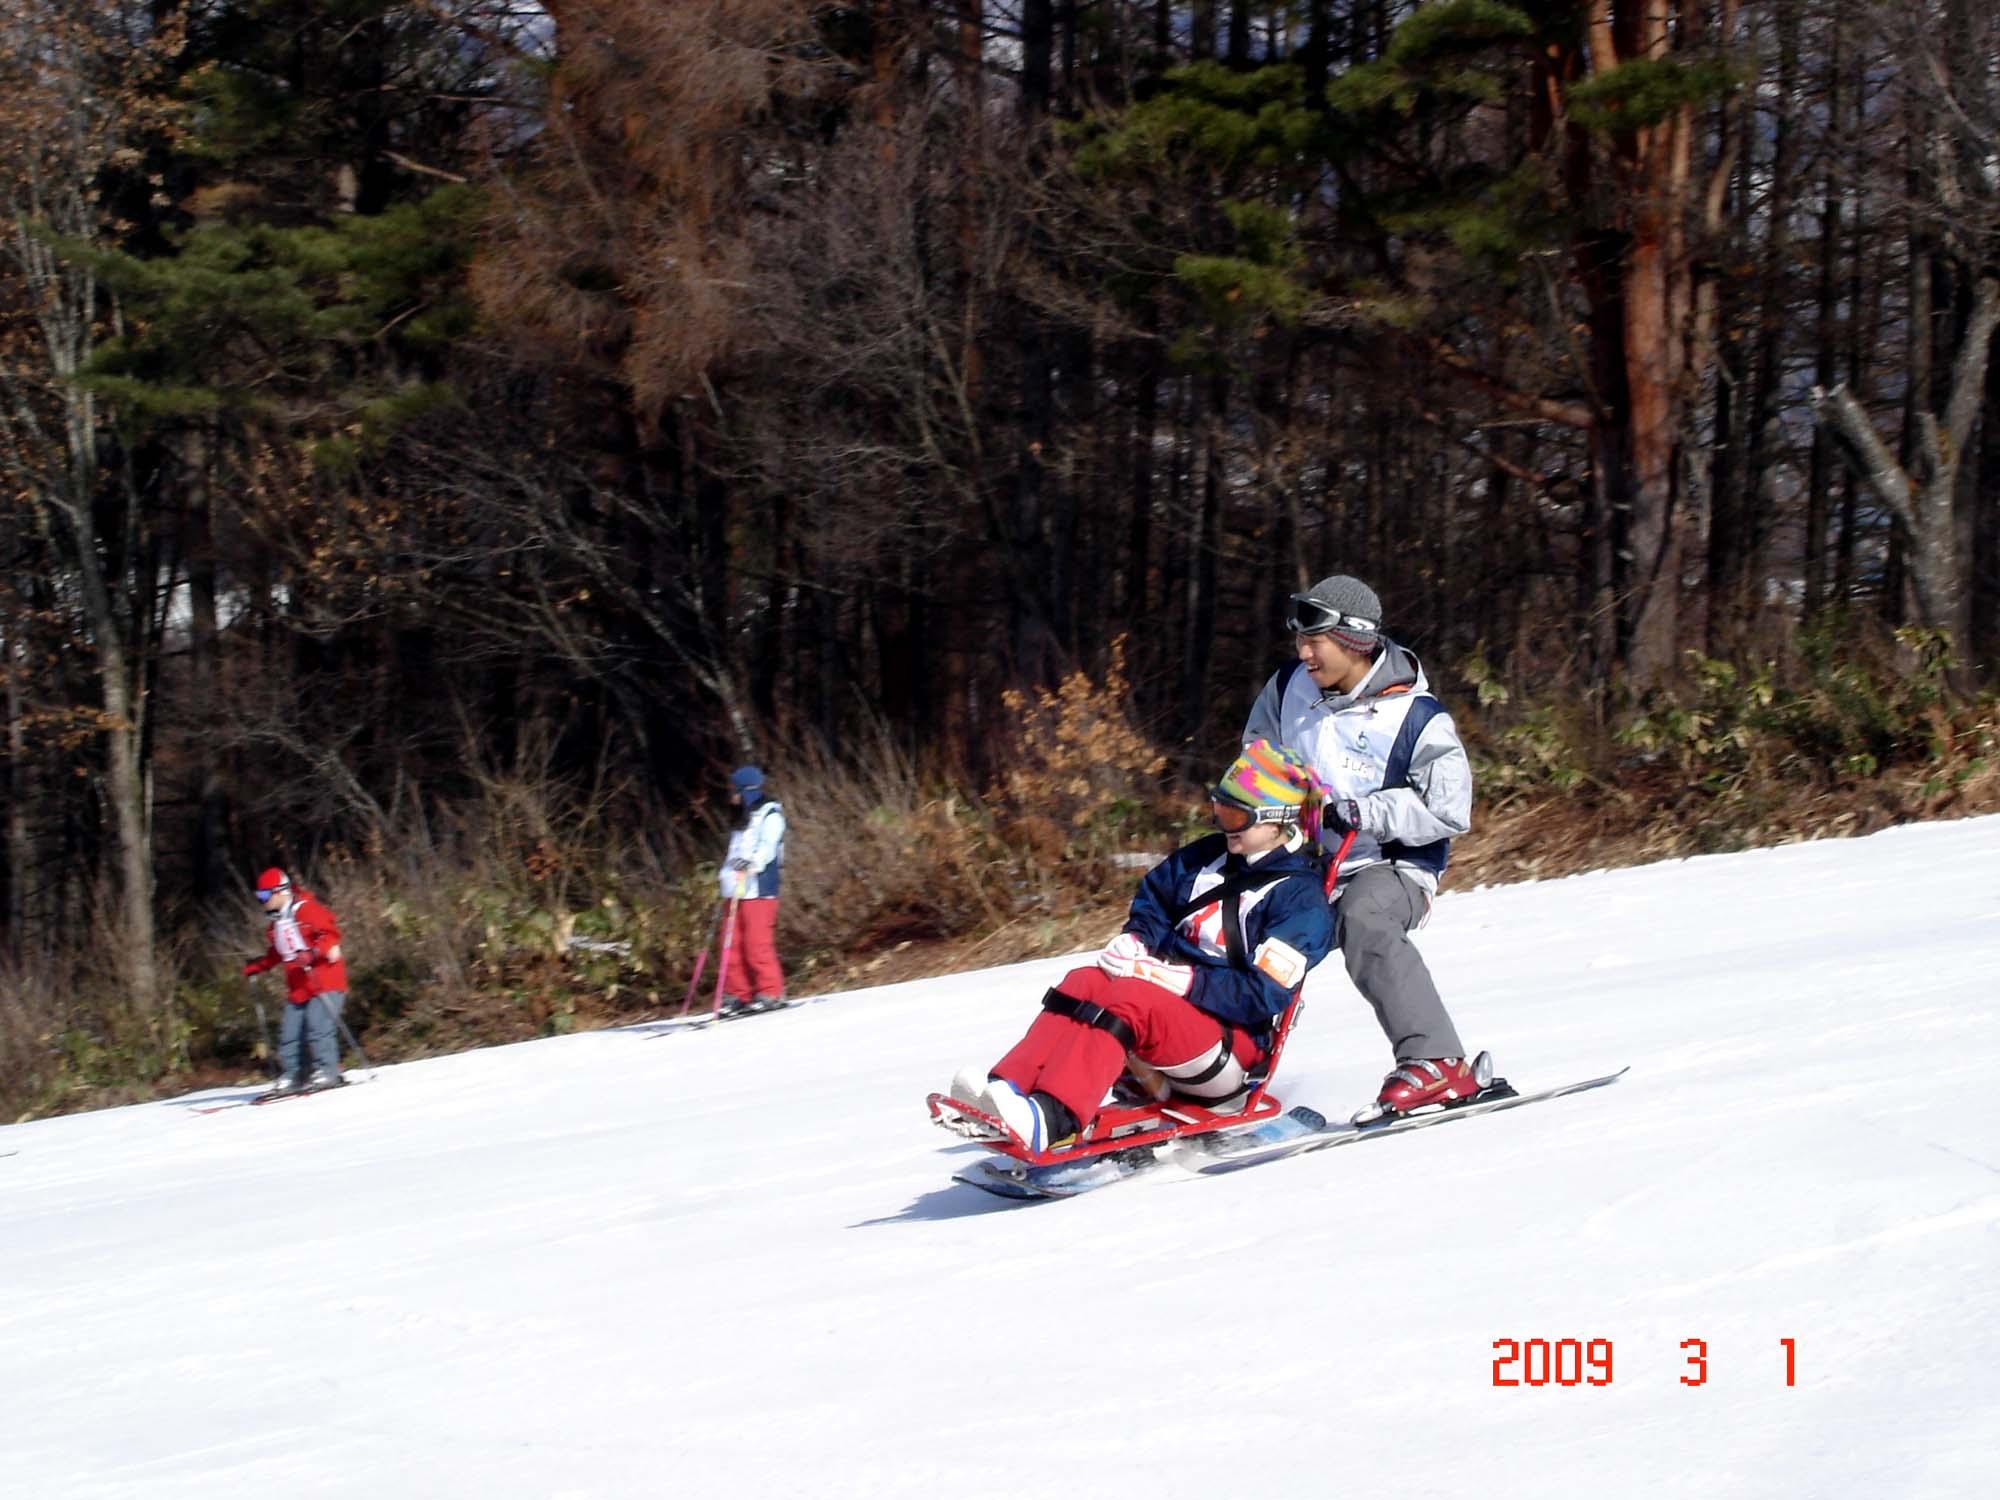 baisuki - スキー教室・・・行ってきました北竜湖!!